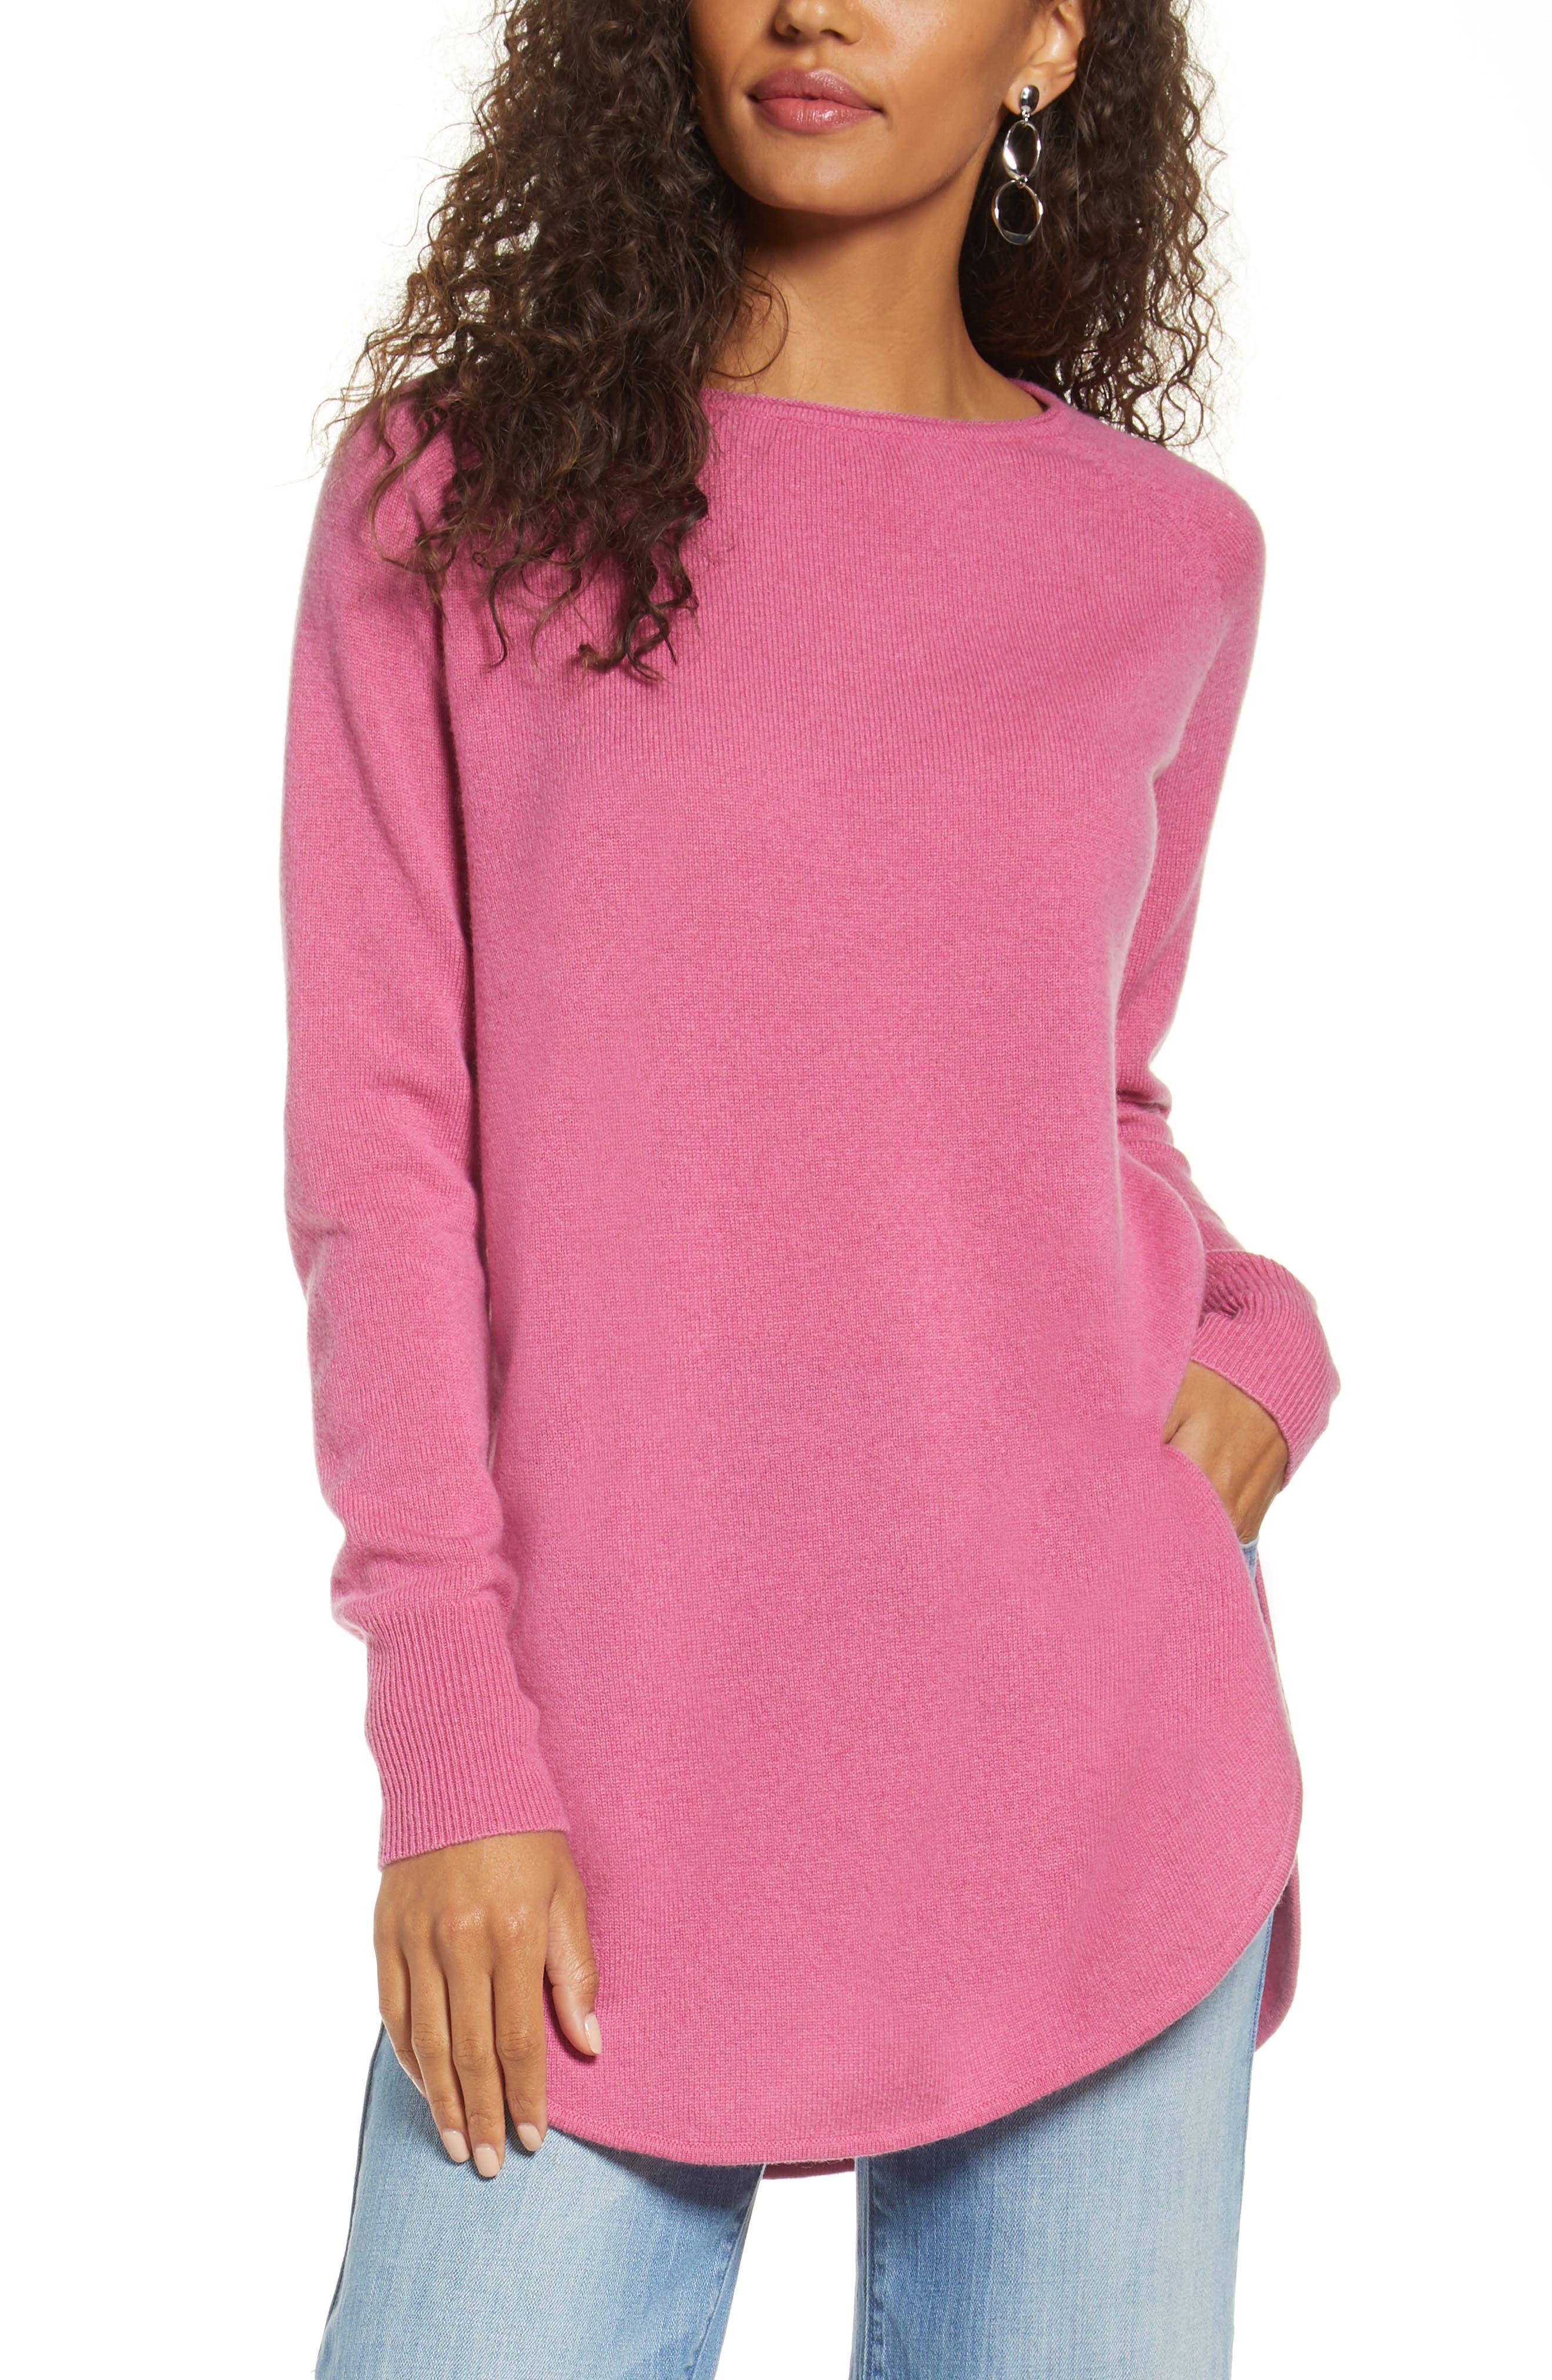 adidas ID Winners V Neck T Shirt Damen Rosa, Nude online